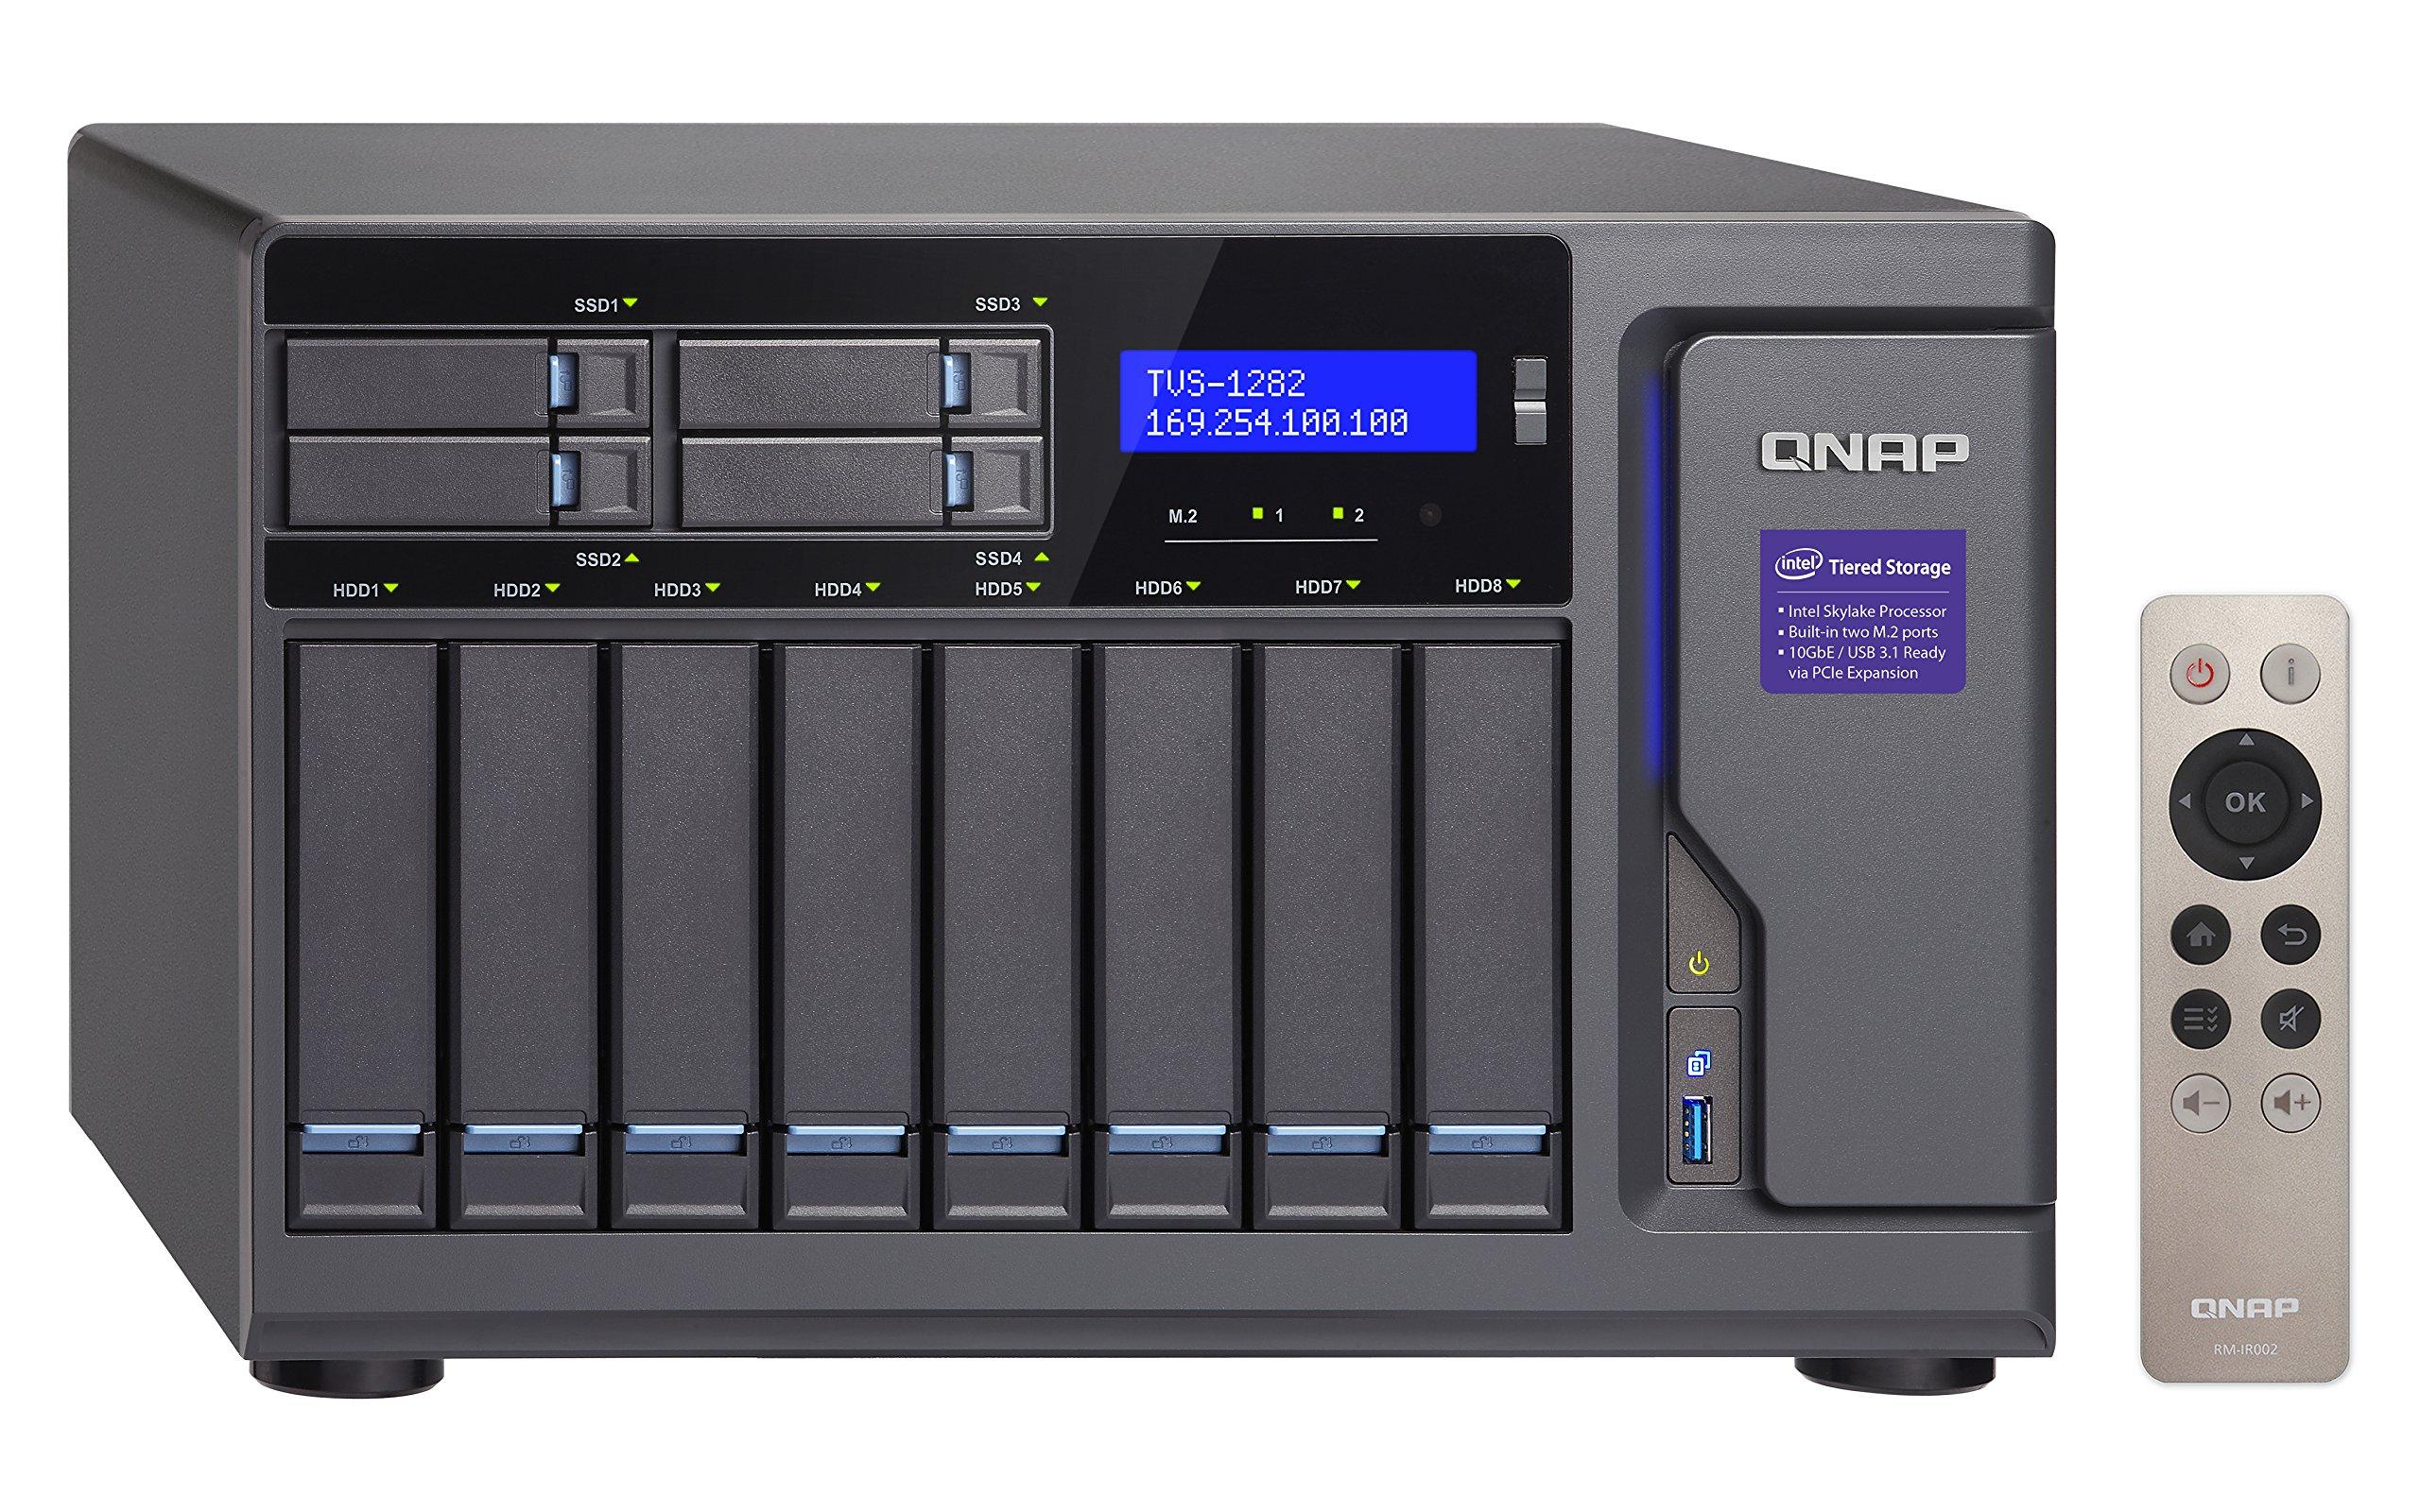 Qnap TVS-1282-i7-64G-US High Performance 12 bay (8+4) NAS/iSCSI IP-SAN, Intel Skylake Core i7-6700 3.4 GHz Quad Core, 32GB RAM, 10G-ready by QNAP (Image #5)